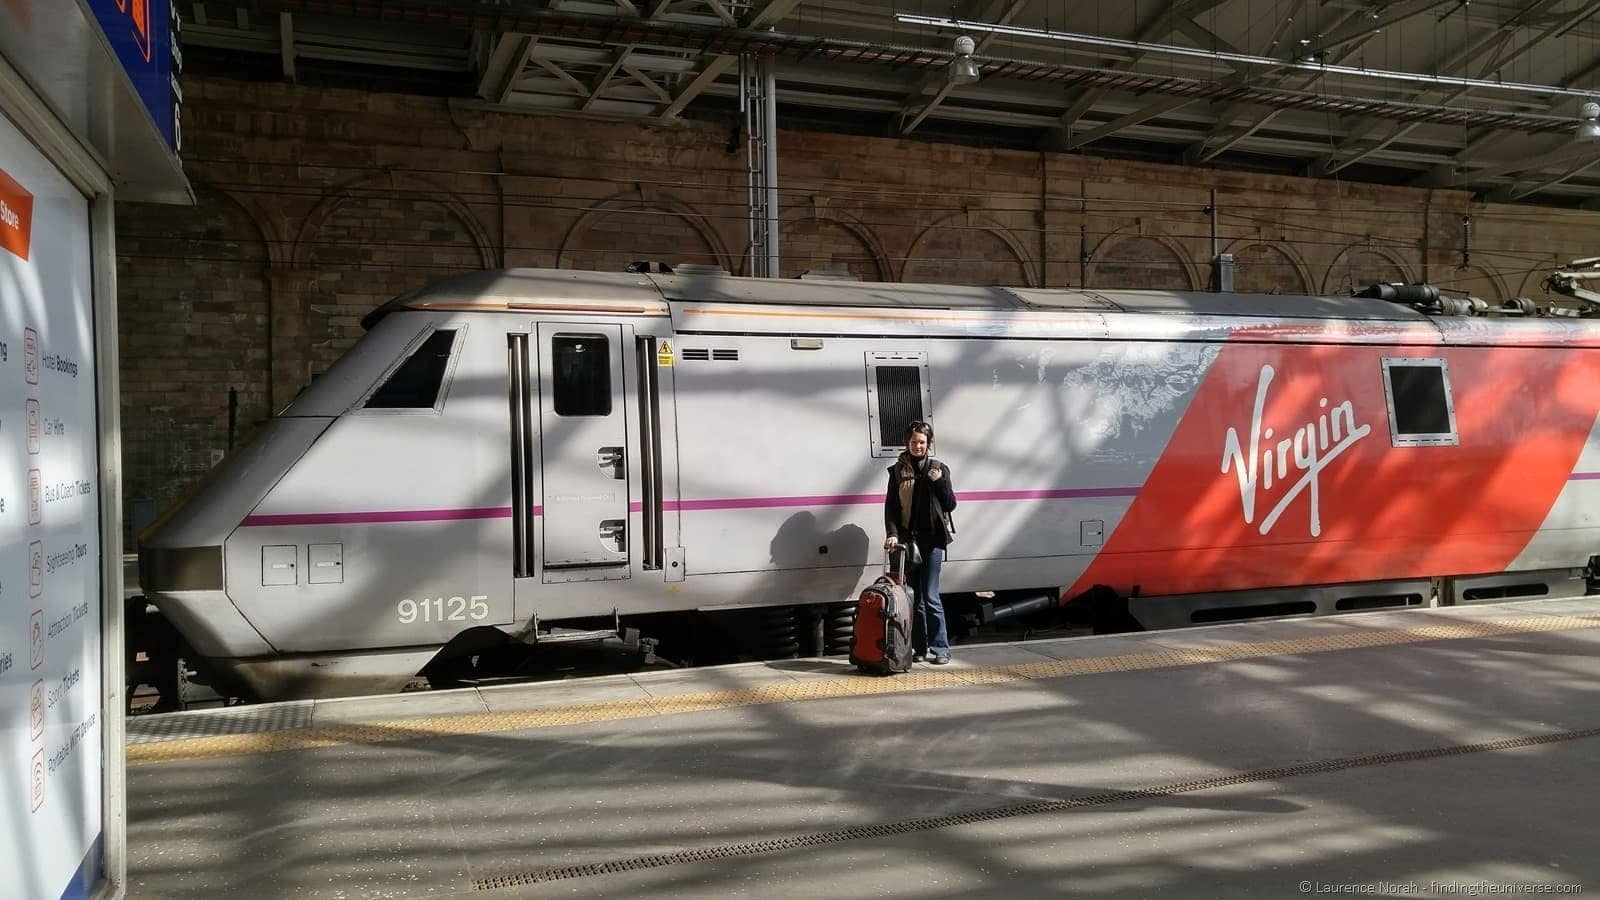 LG G4 virgin train HDR on